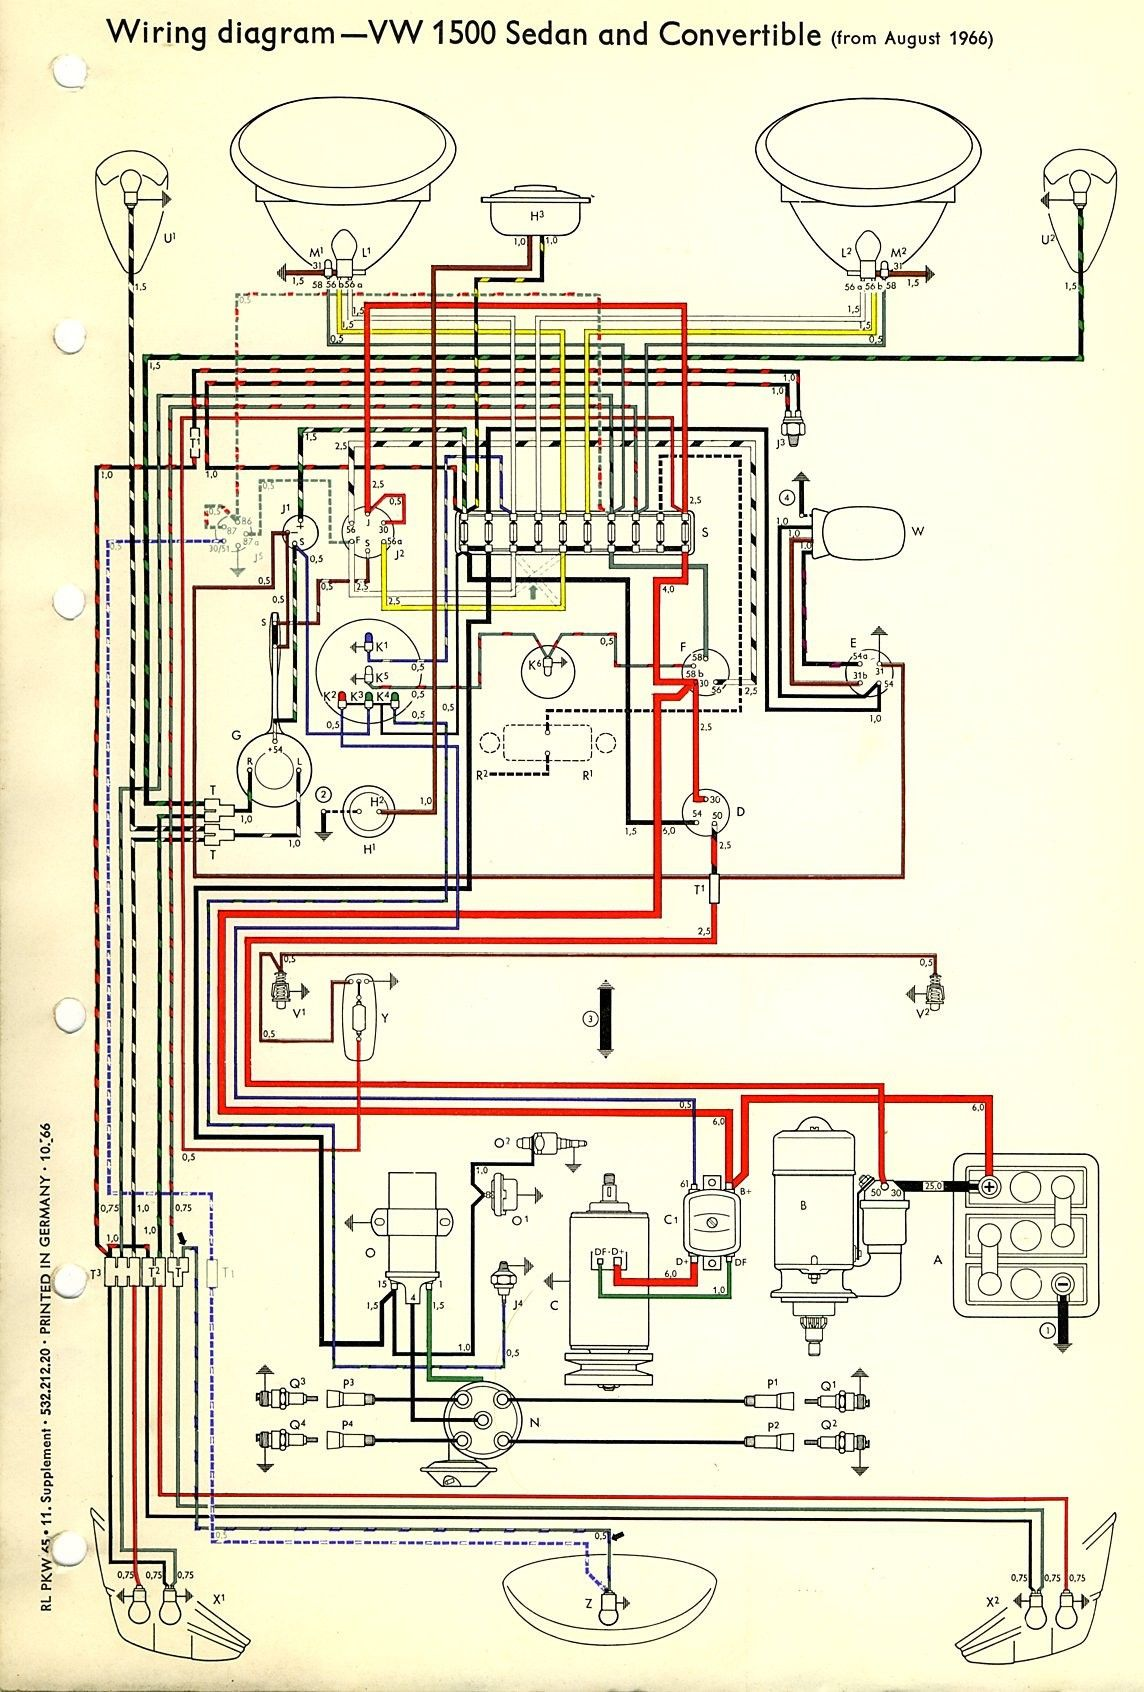 Reference Vw Wiring Diagram Symbols Joescablecar In 2020 Vw Bug Vw Super Beetle Dune Buggy